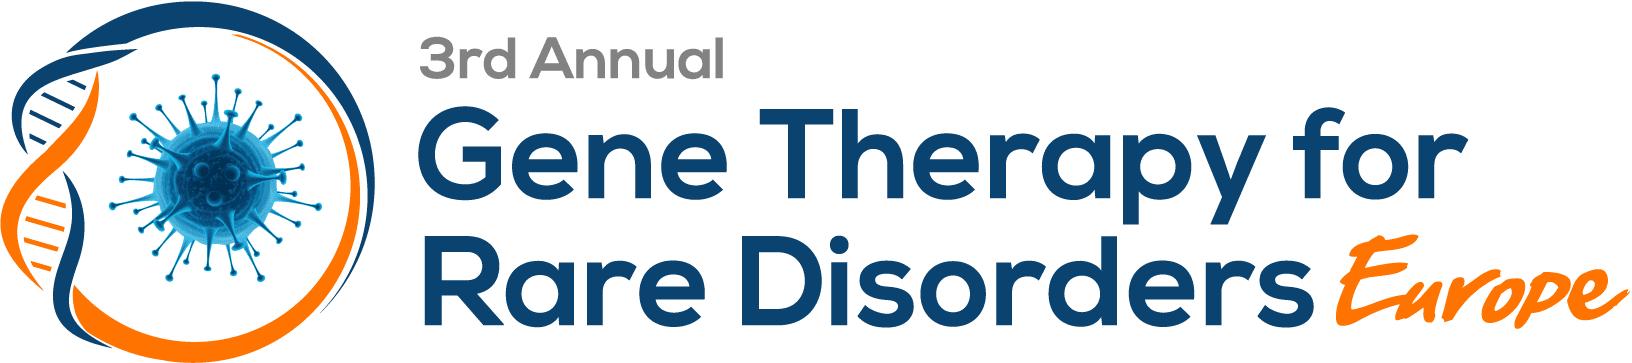 4384_Gene_Therapy_2020_Europe_Logo